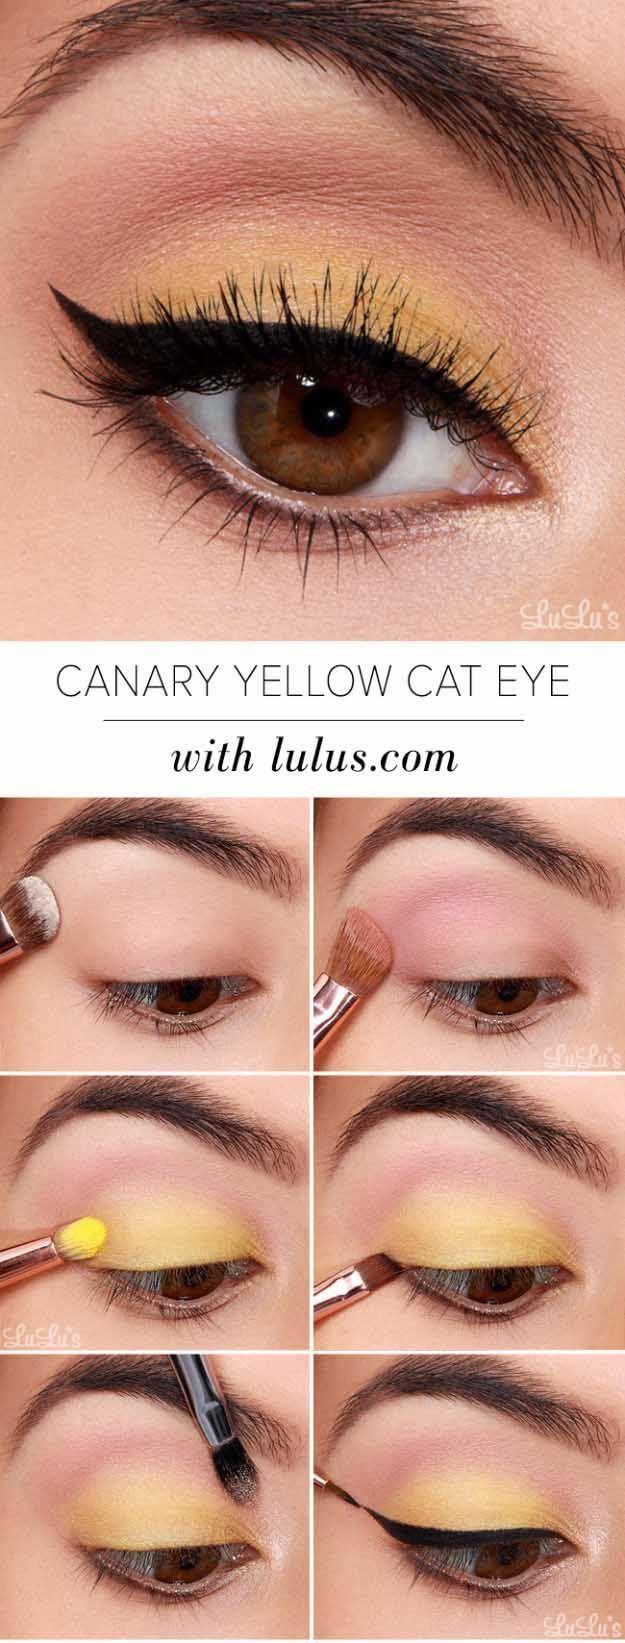 32 eyeshadow tutorials for beginners | made up | yellow eye